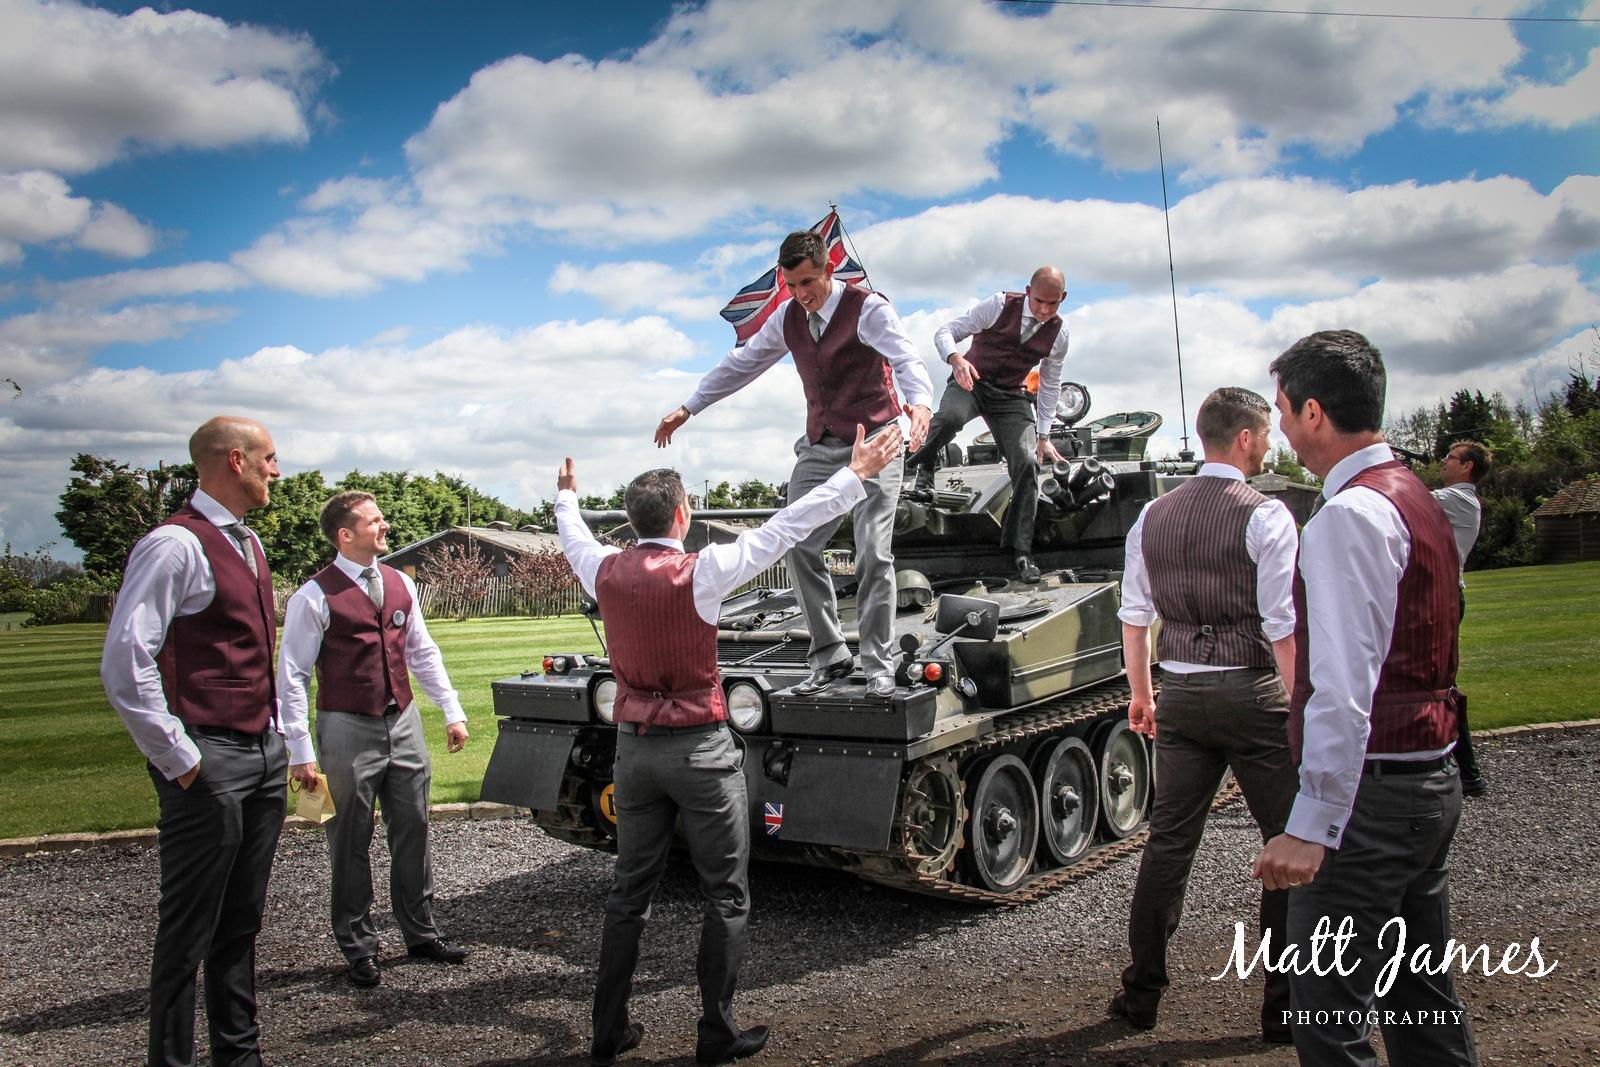 Sevenoaks-documentary-wedding-photographer-53